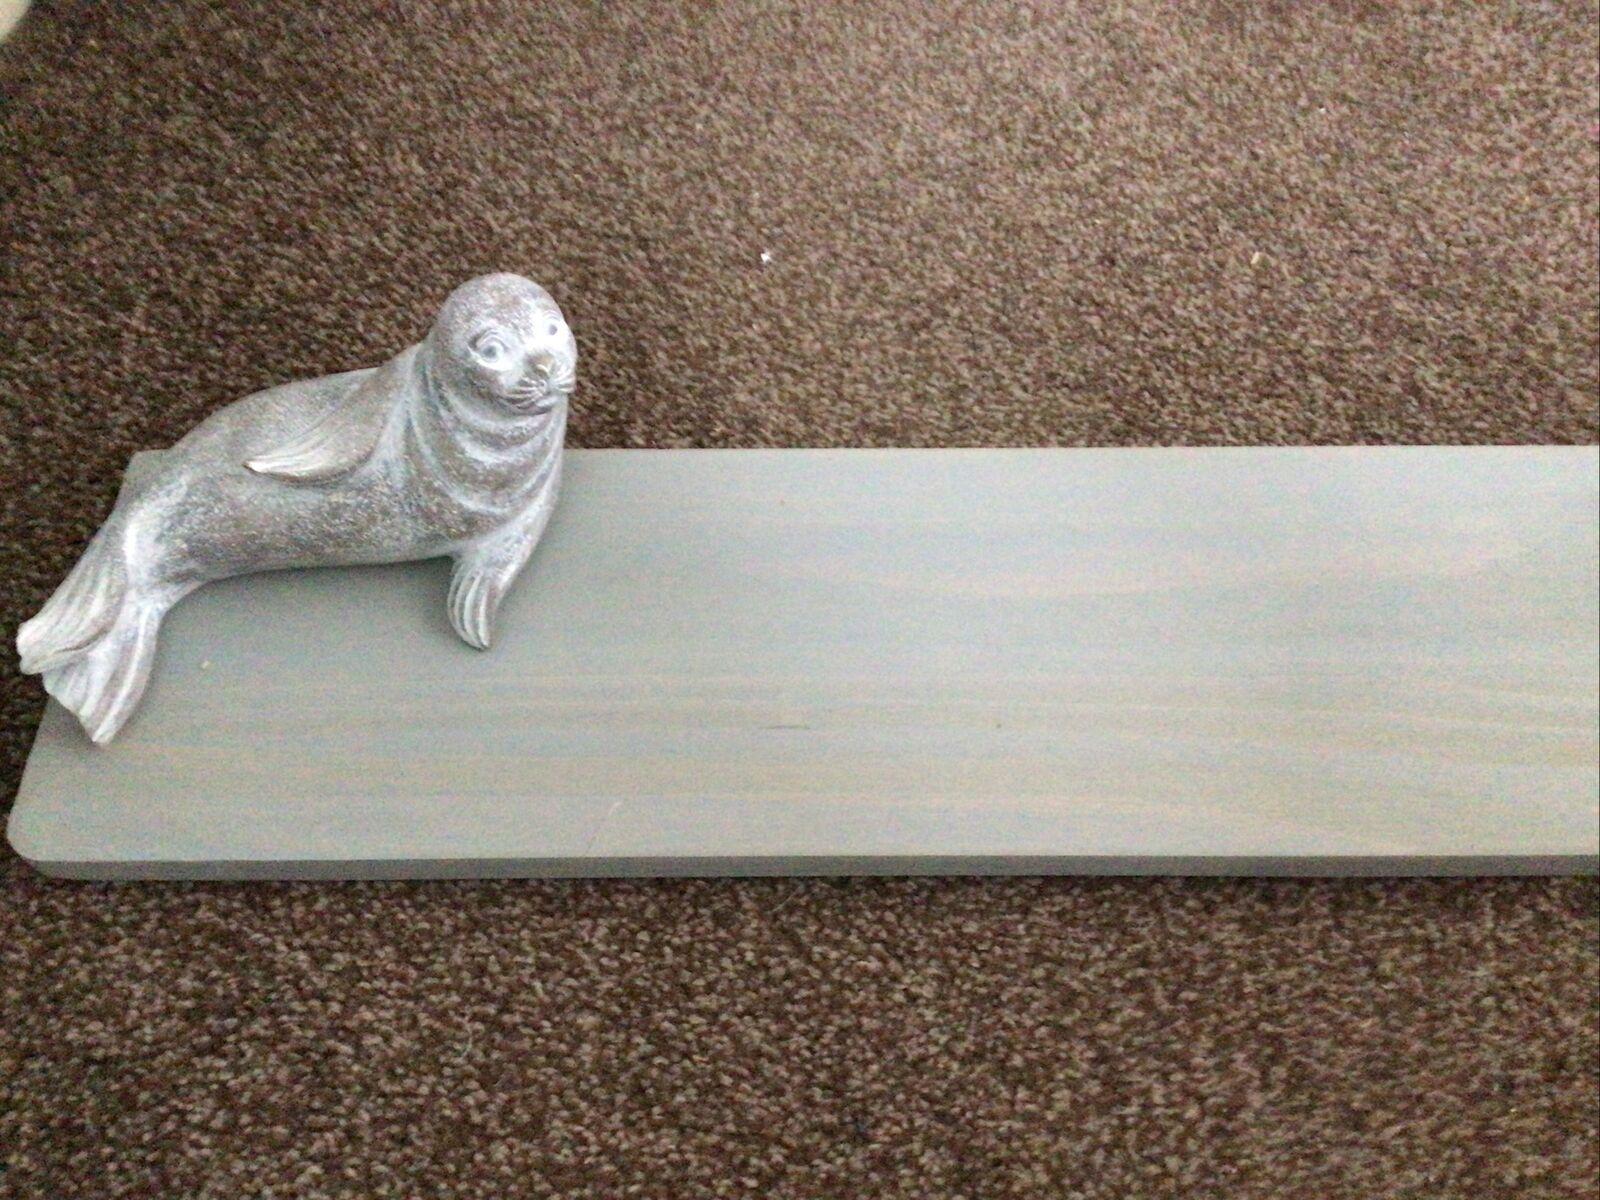 "BNIB Gorgeous Next Grey Wooden Seal Shelf 24"" X5"" Lovely Item"